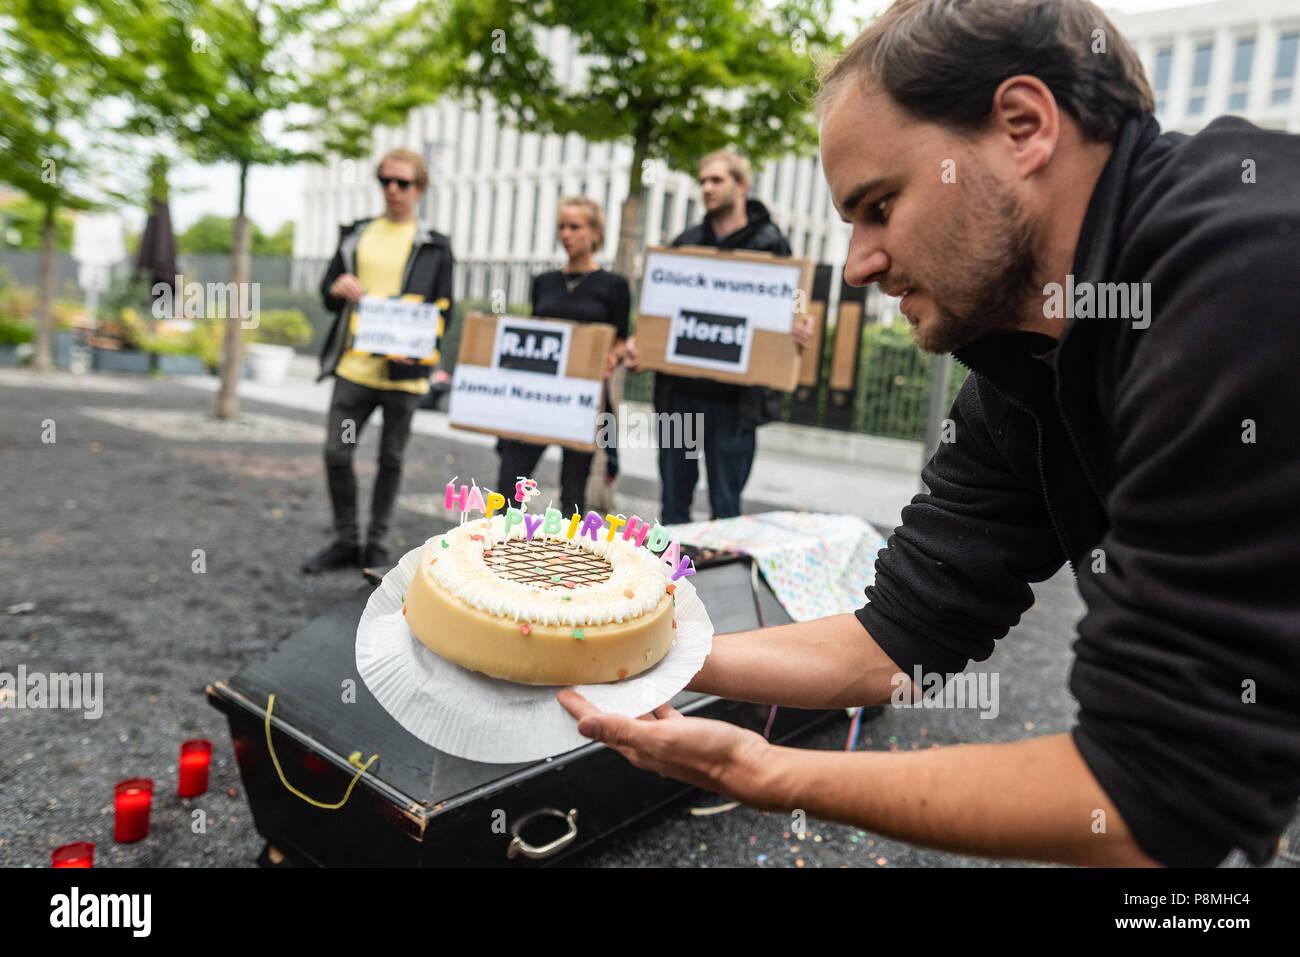 An Activist Seen Holding A Birthday Cake For Horst Seehofer